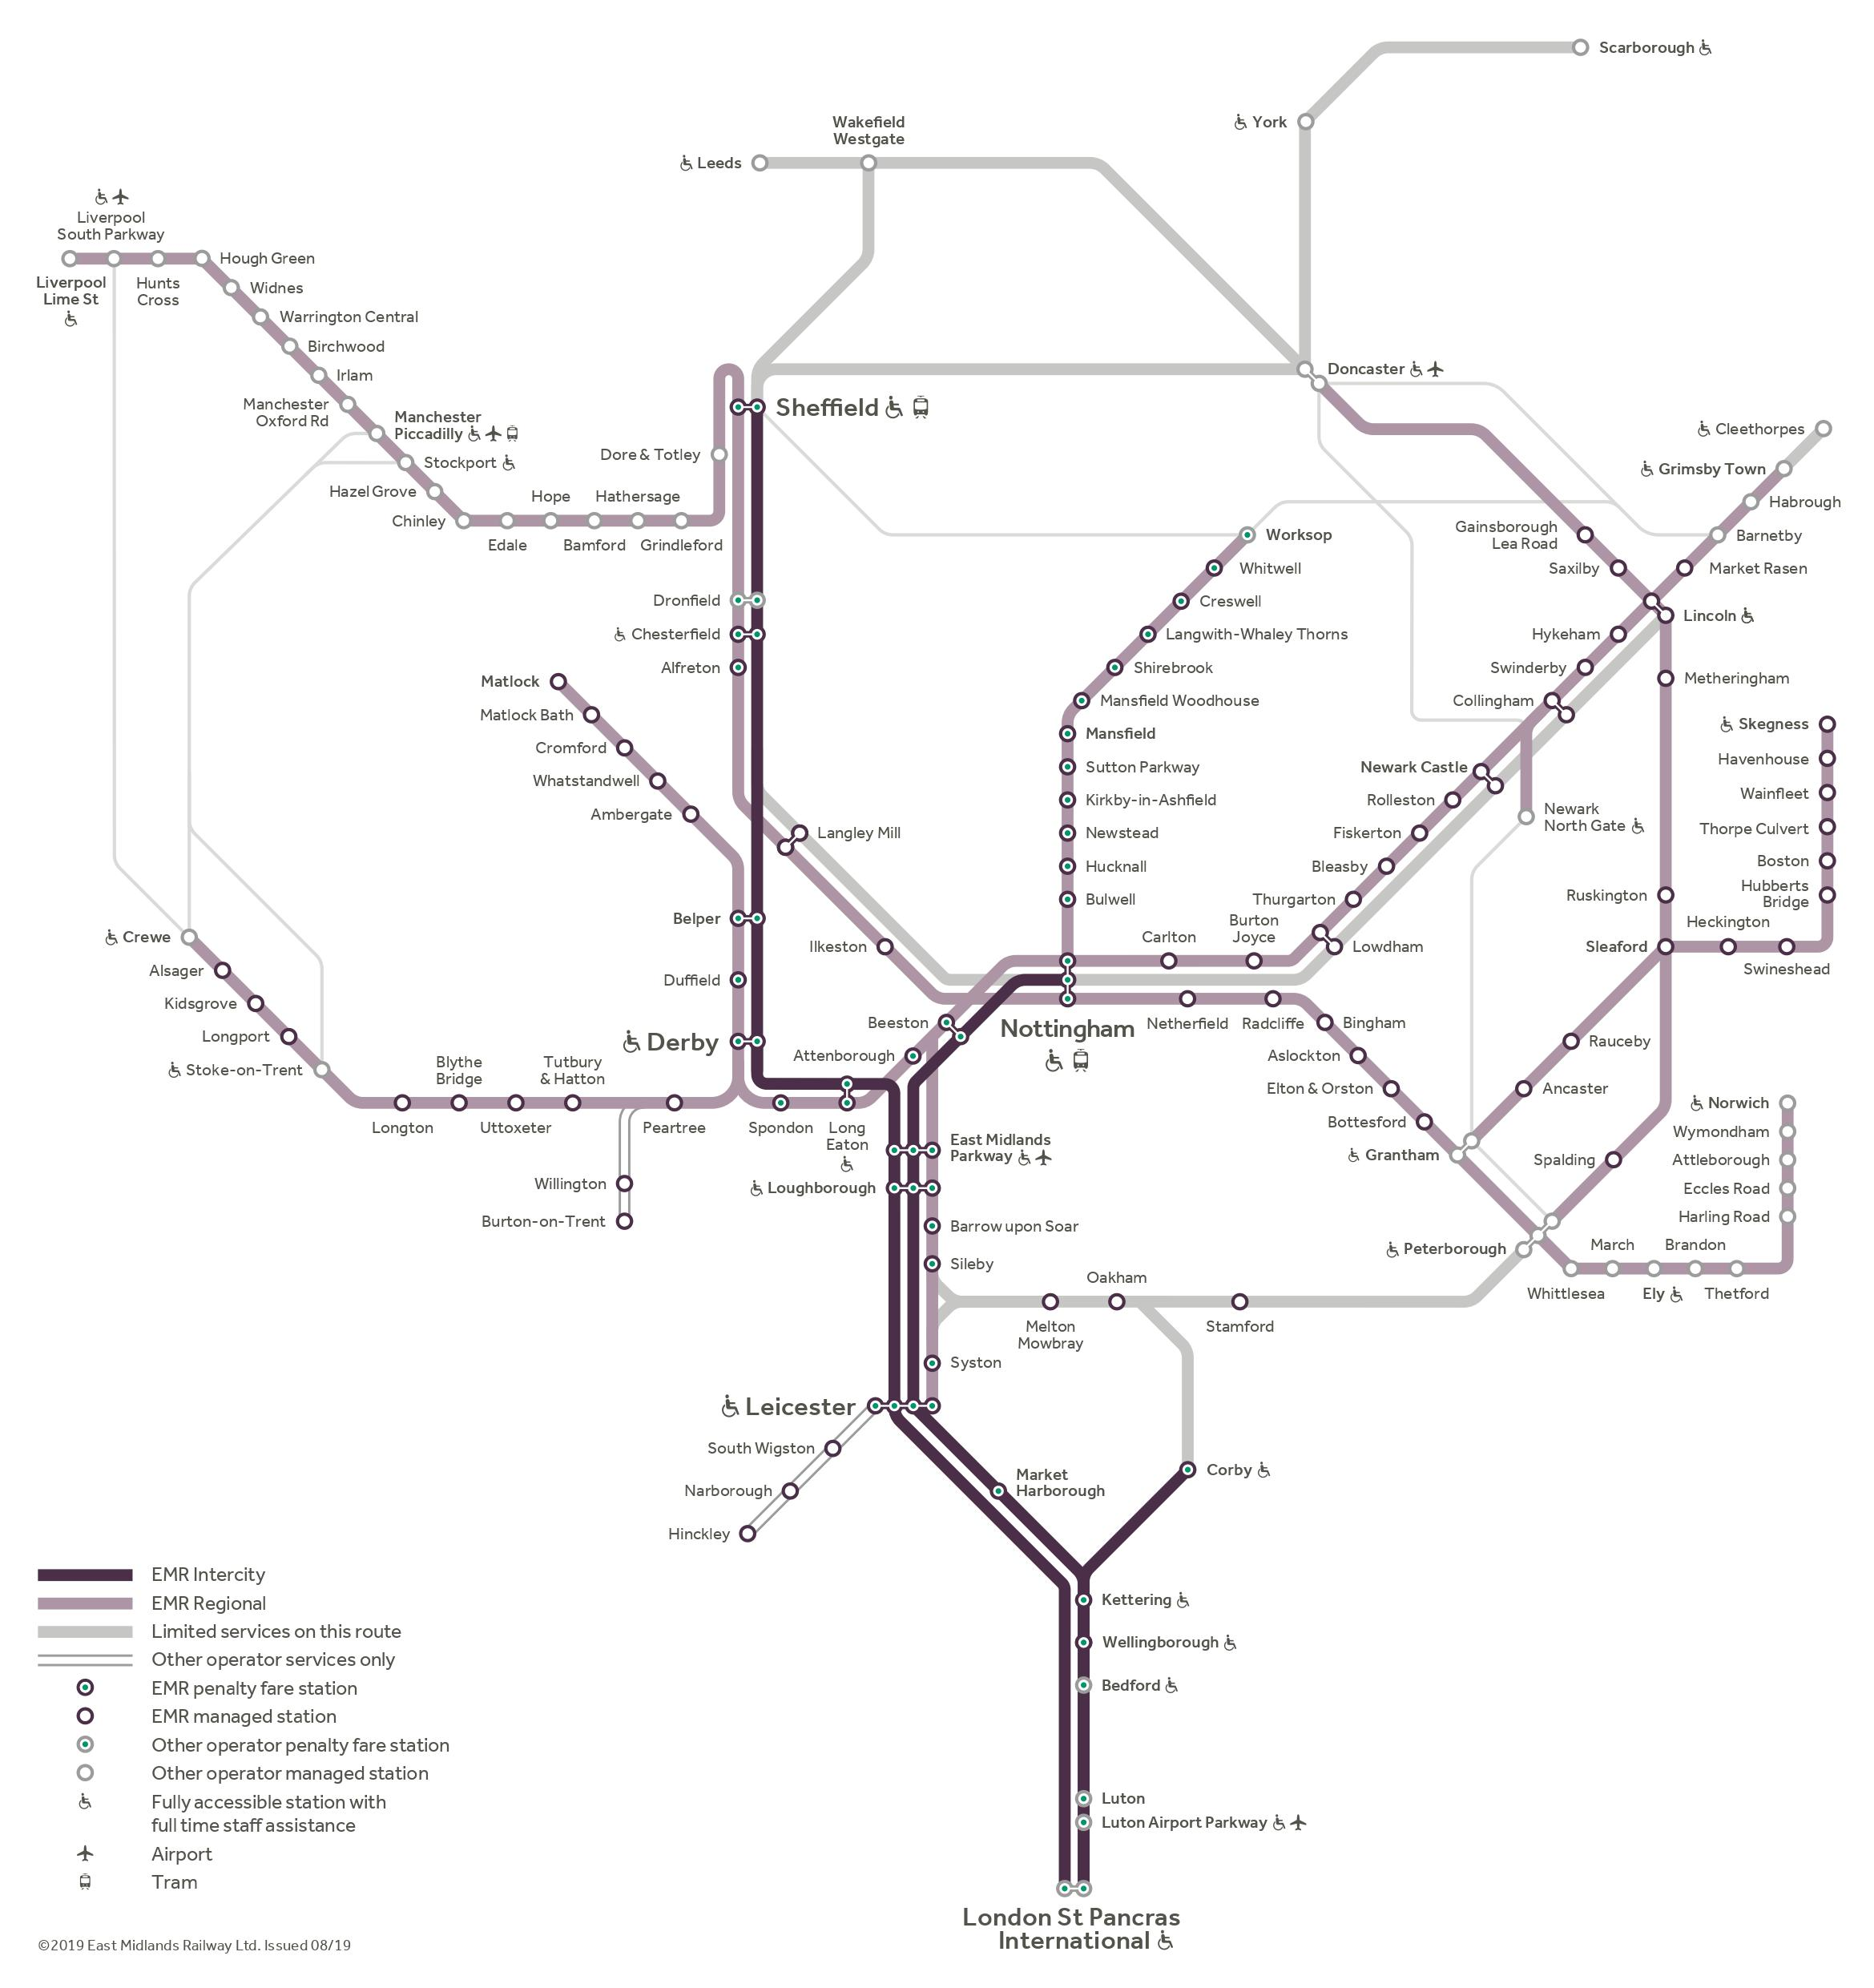 Train route map of East Midlands   EMR   East Midlands Railway